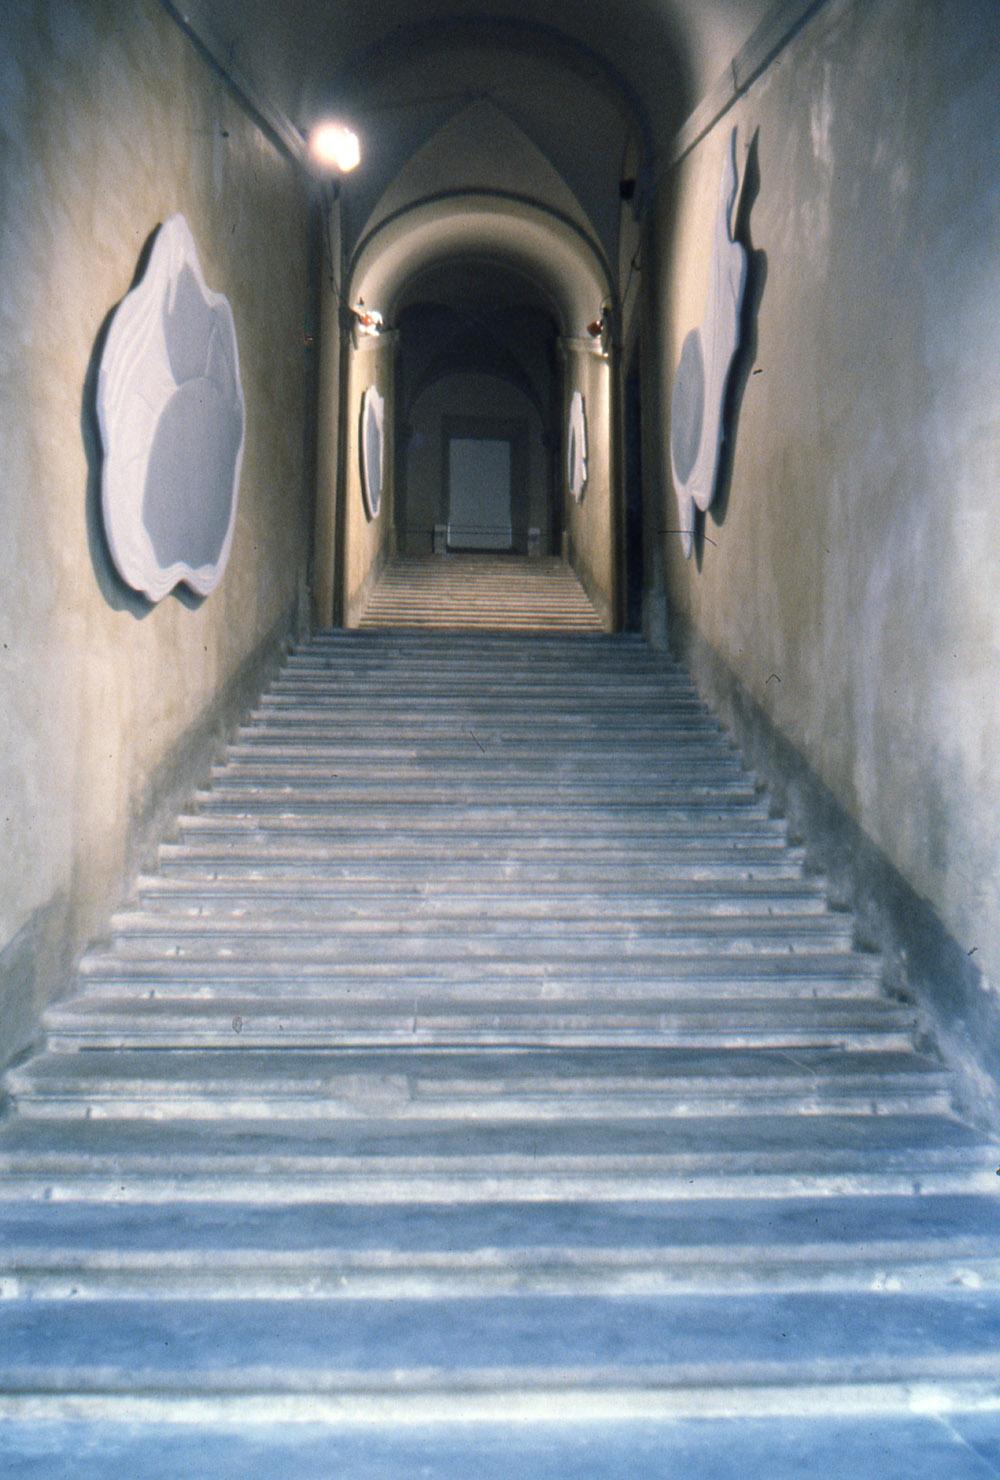 exhibition-at-the-Spoleto-Figura-Femminile-Impudica-Fagments-I-IV.jpg